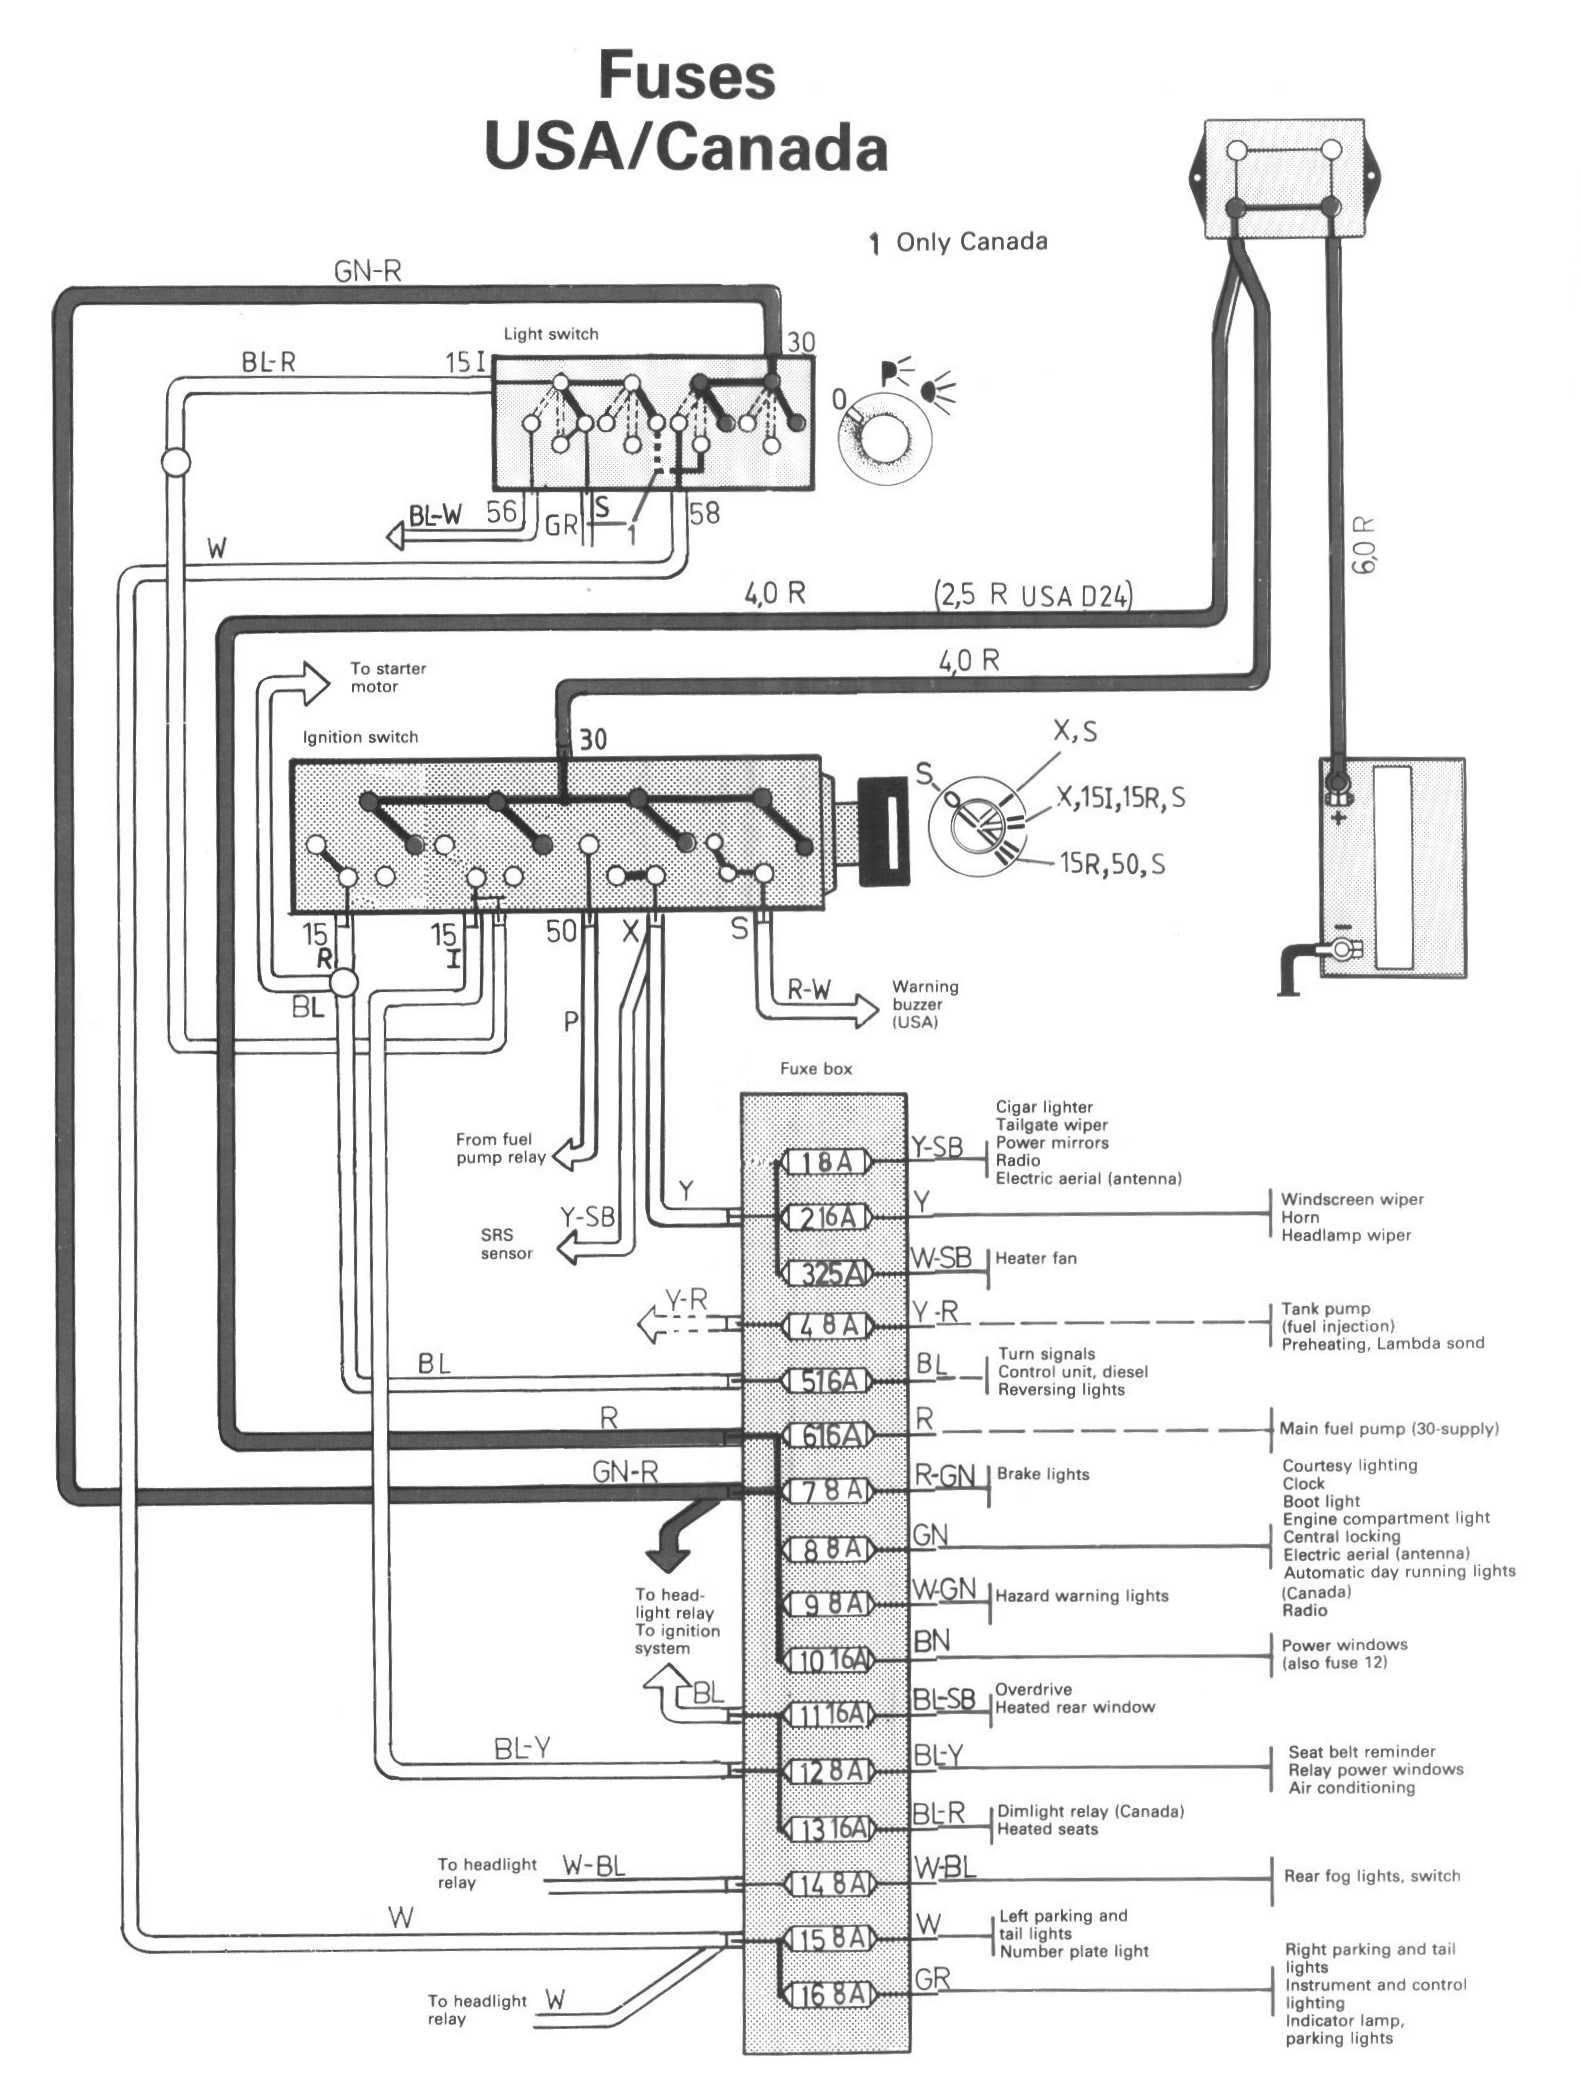 Volvo 240 Radio Wiring Diagram Stereo Wiring Diagram Honda Civic 2000 Mazda3 Sp23 Ati Loro Jeanjaures37 Fr